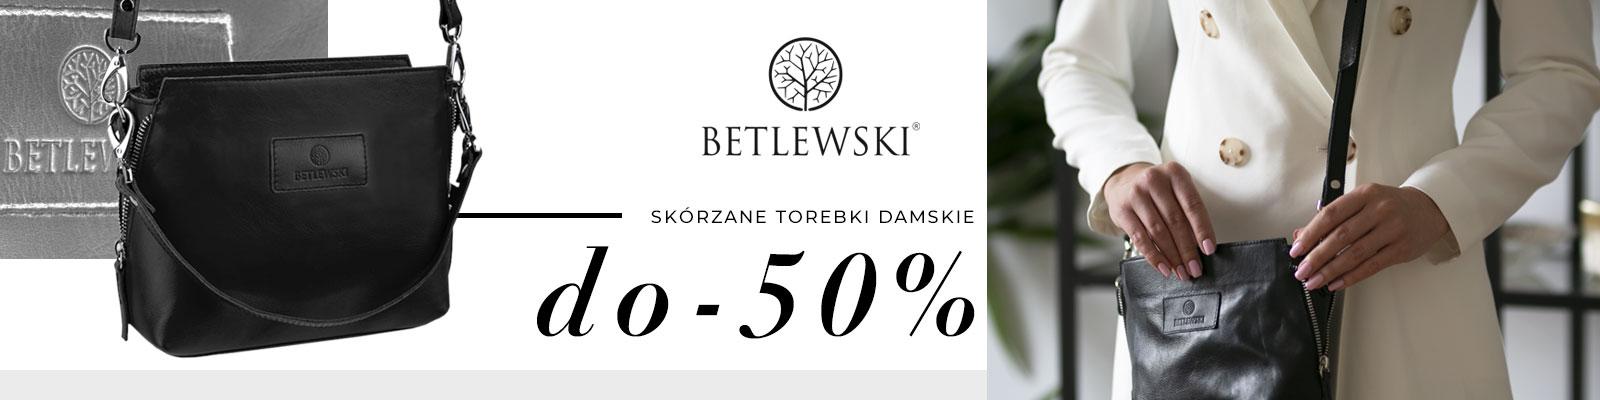 Betlewski - torebki damskie do -50%